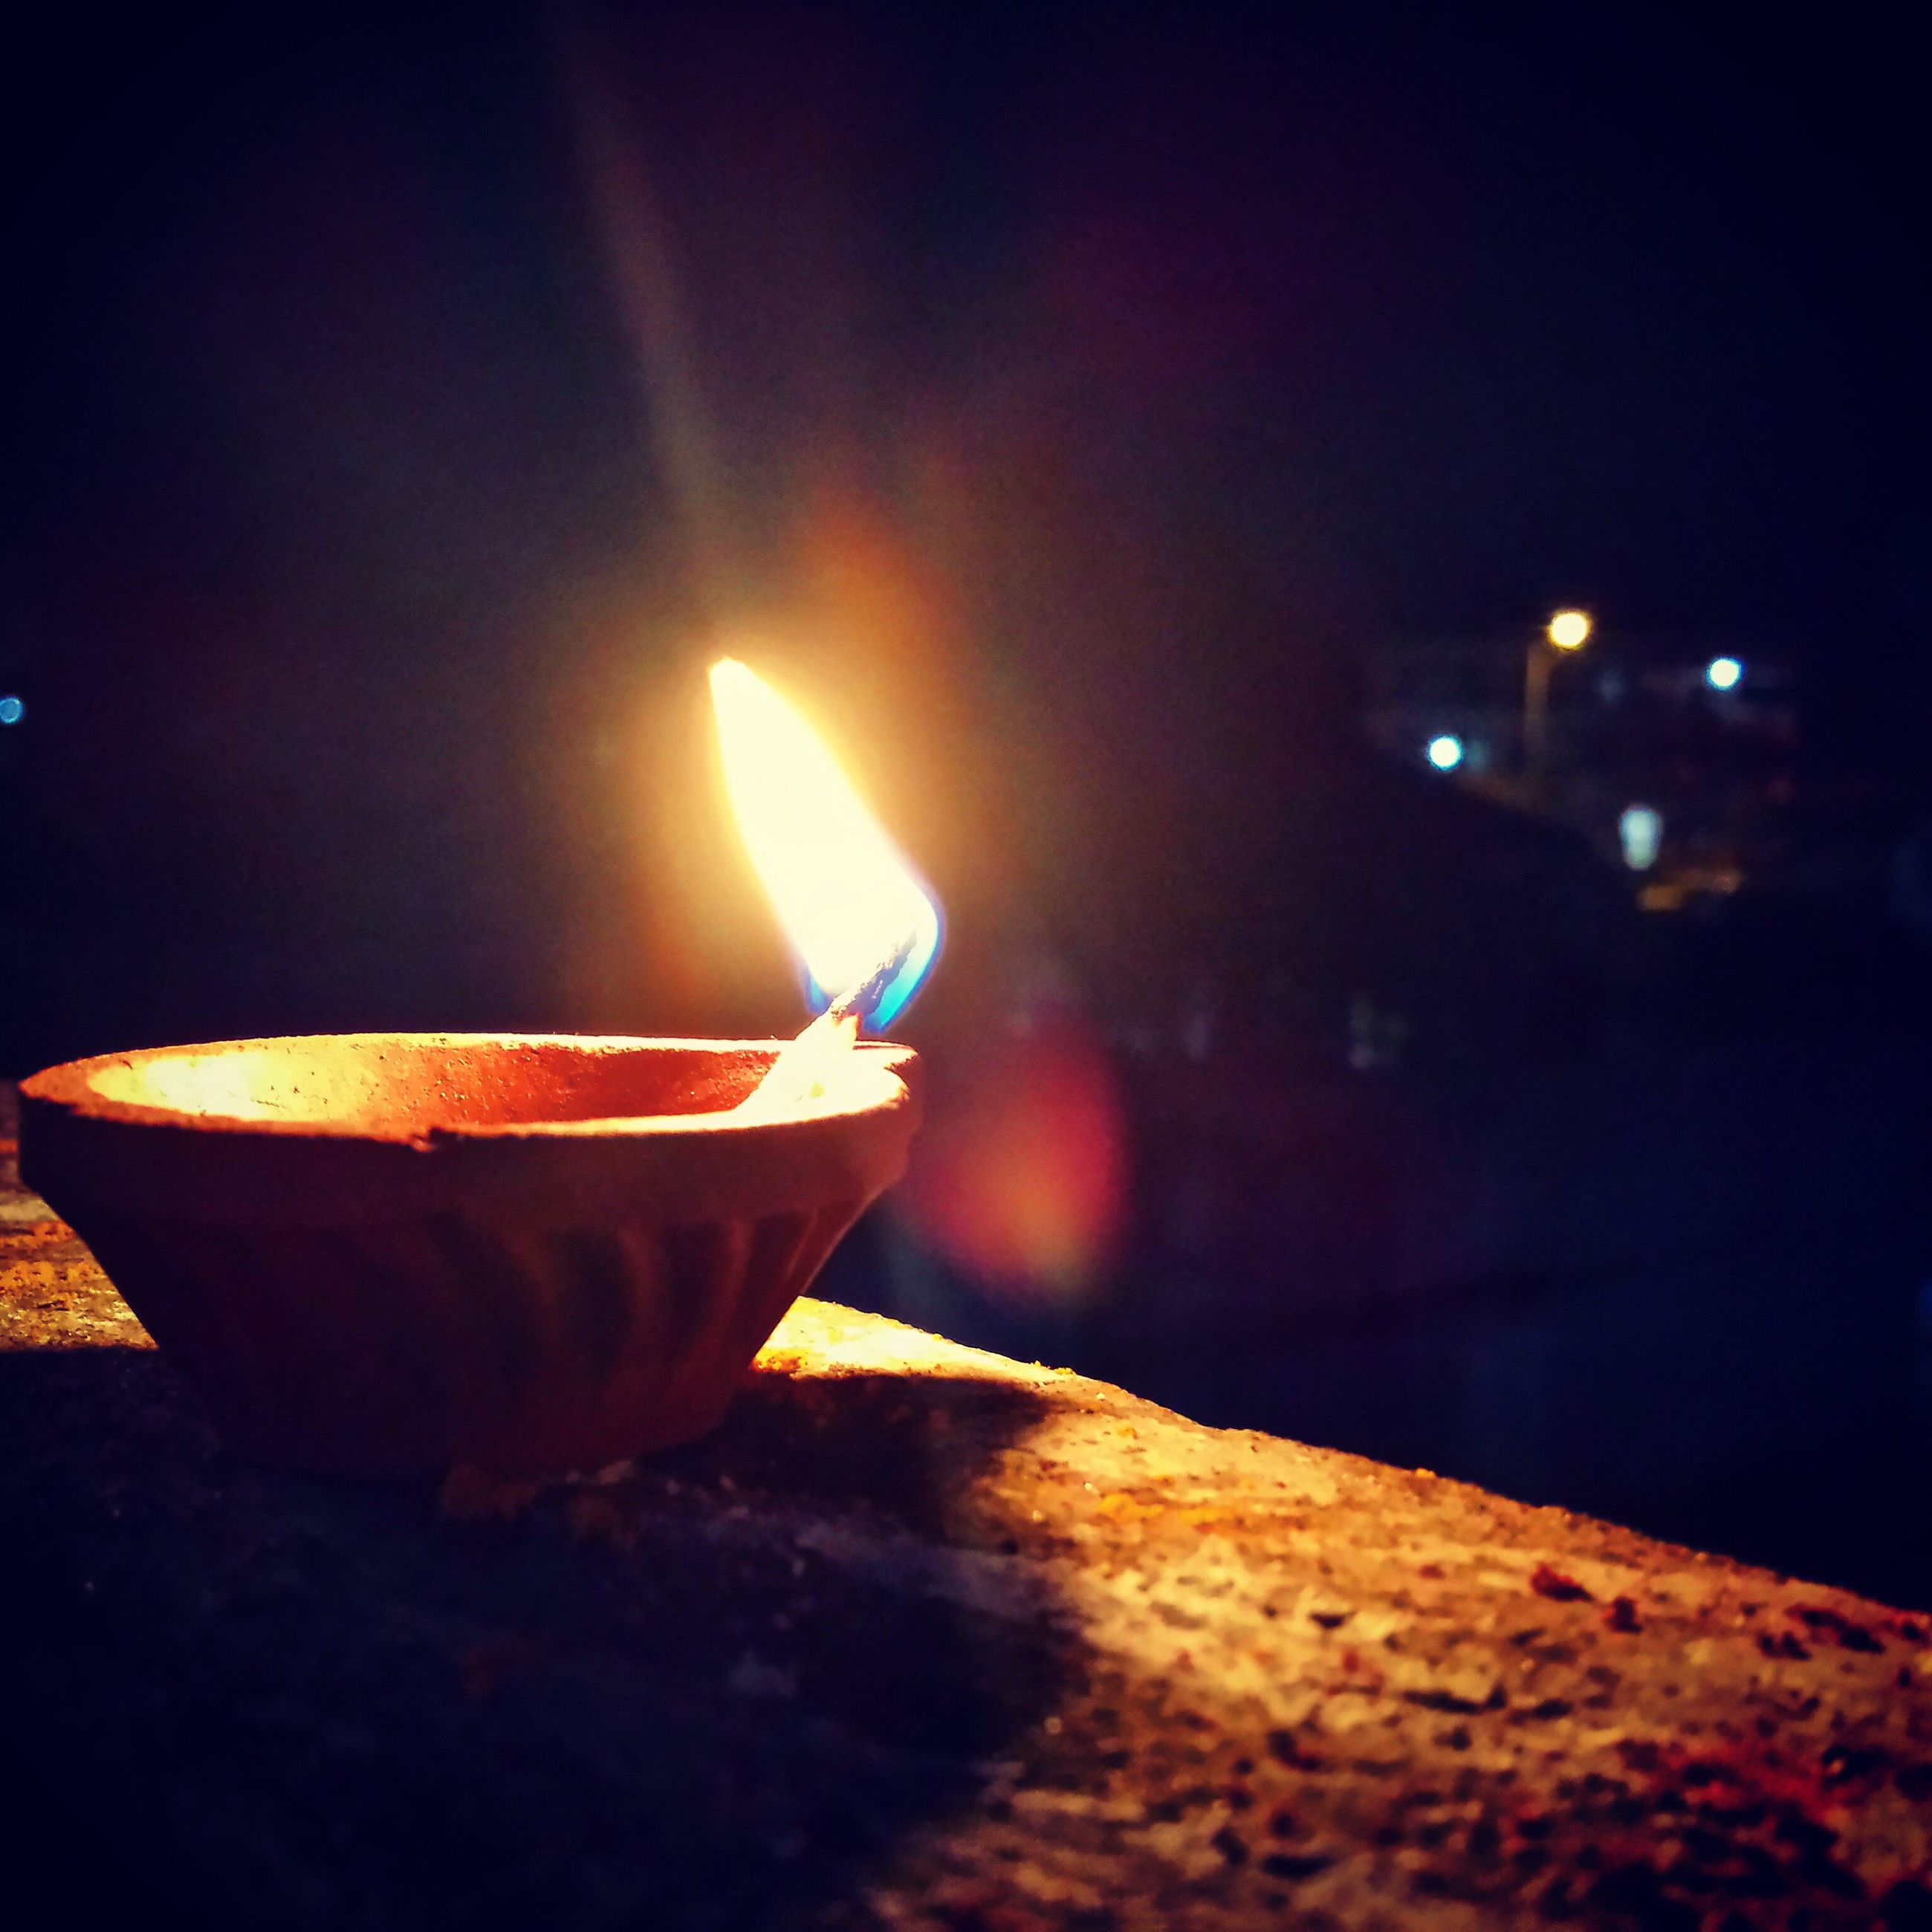 night, burning, illuminated, flame, heat - temperature, glowing, lighting equipment, diya - oil lamp, diwali, oil lamp, celebration, close-up, no people, retaining wall, outdoors